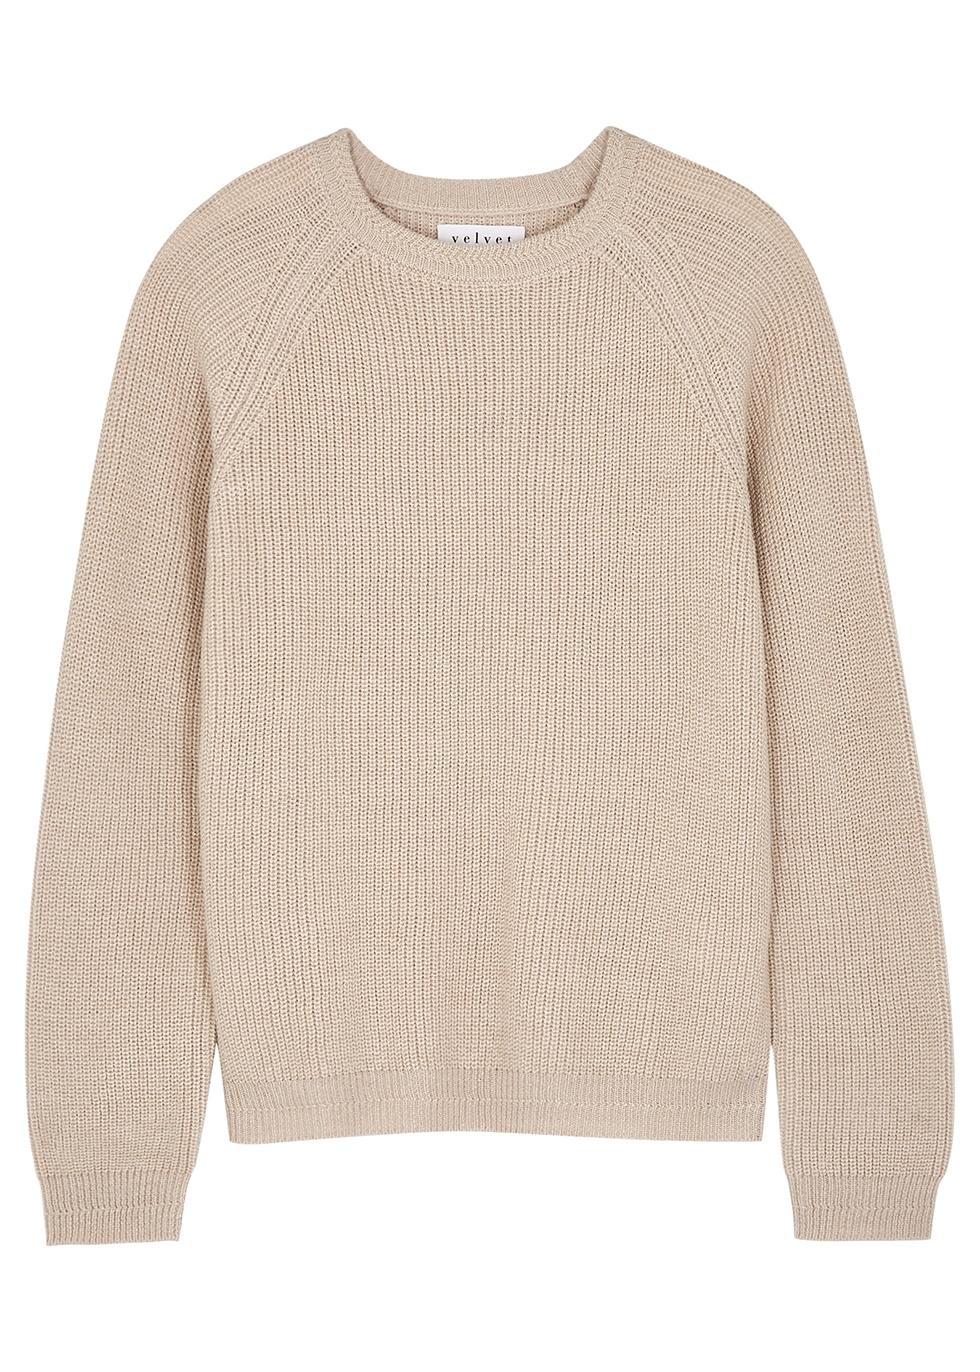 Charli metallic-weave ribbed-knit jumper